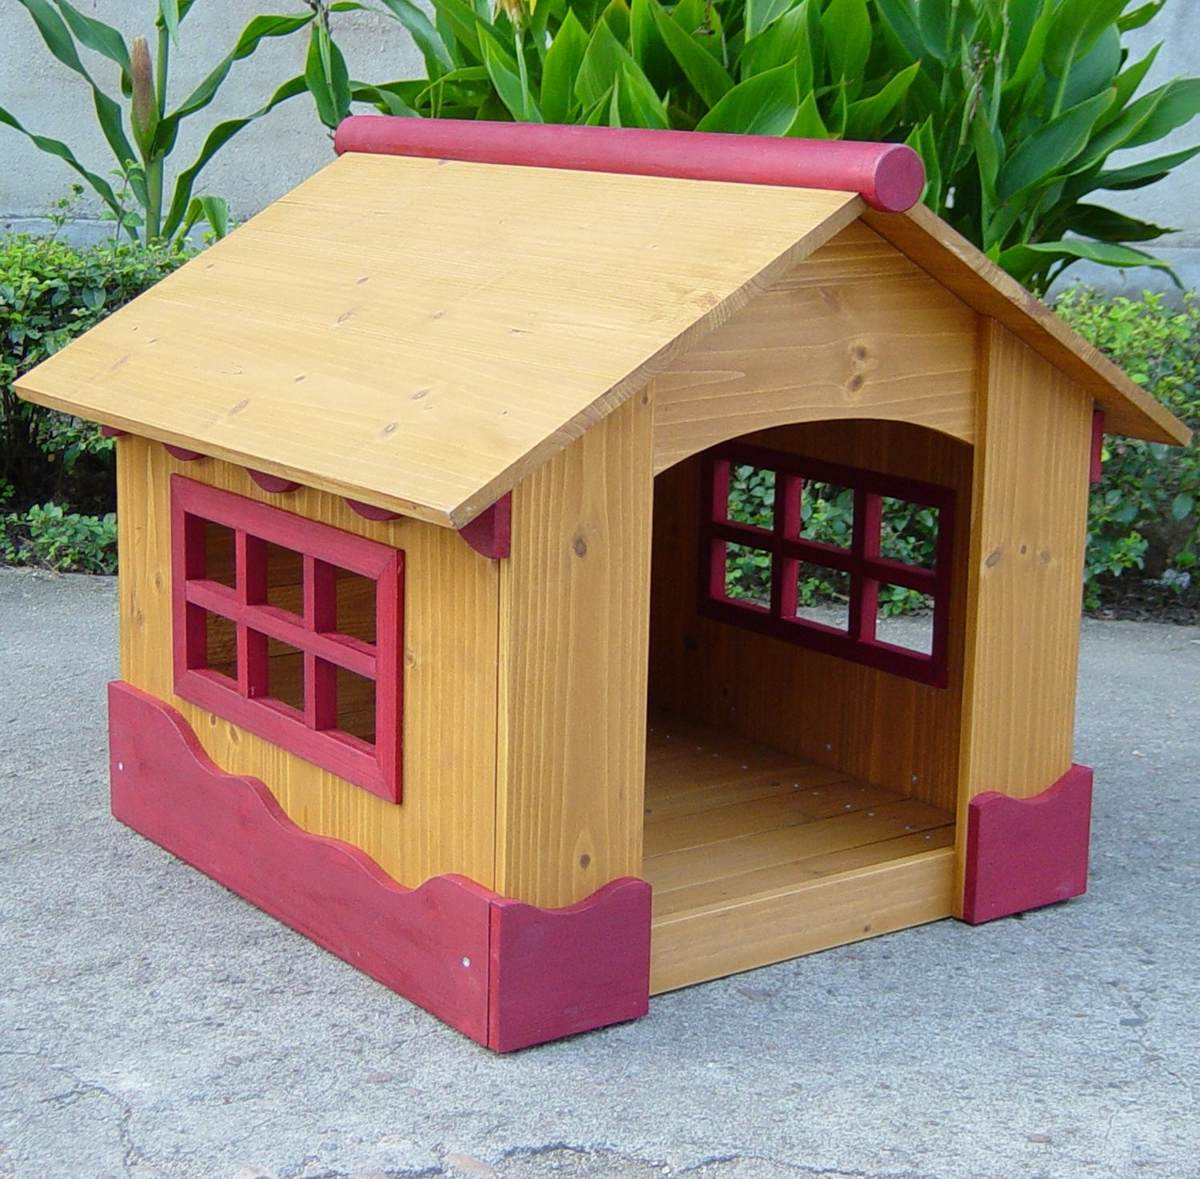 Casa para mascotas perros madera peque a vv4 2 - Casa perros madera ...